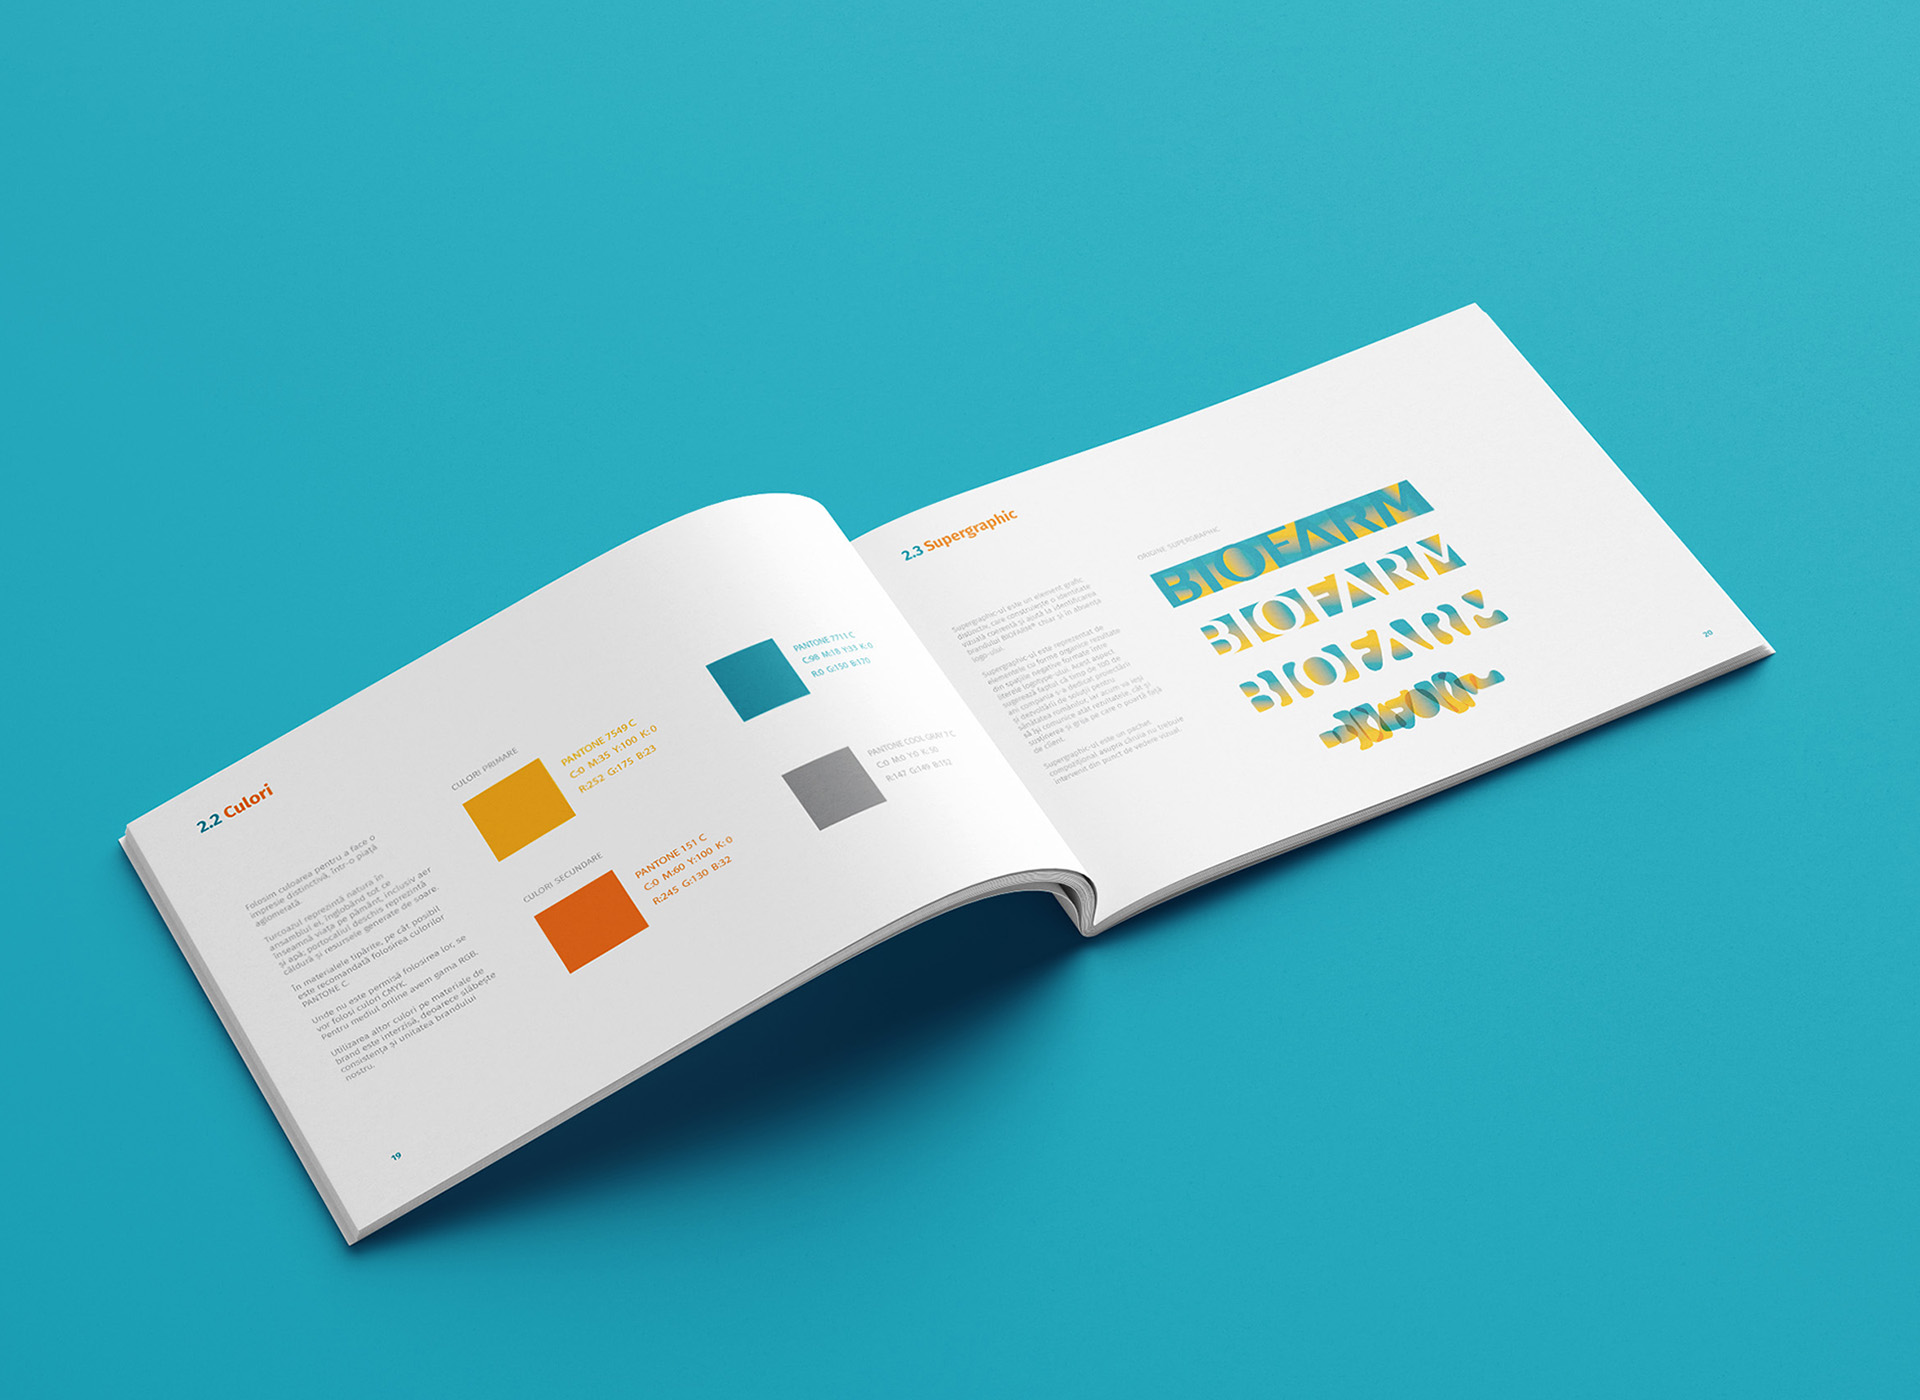 Biofarm portofoliu inoveo brandbook